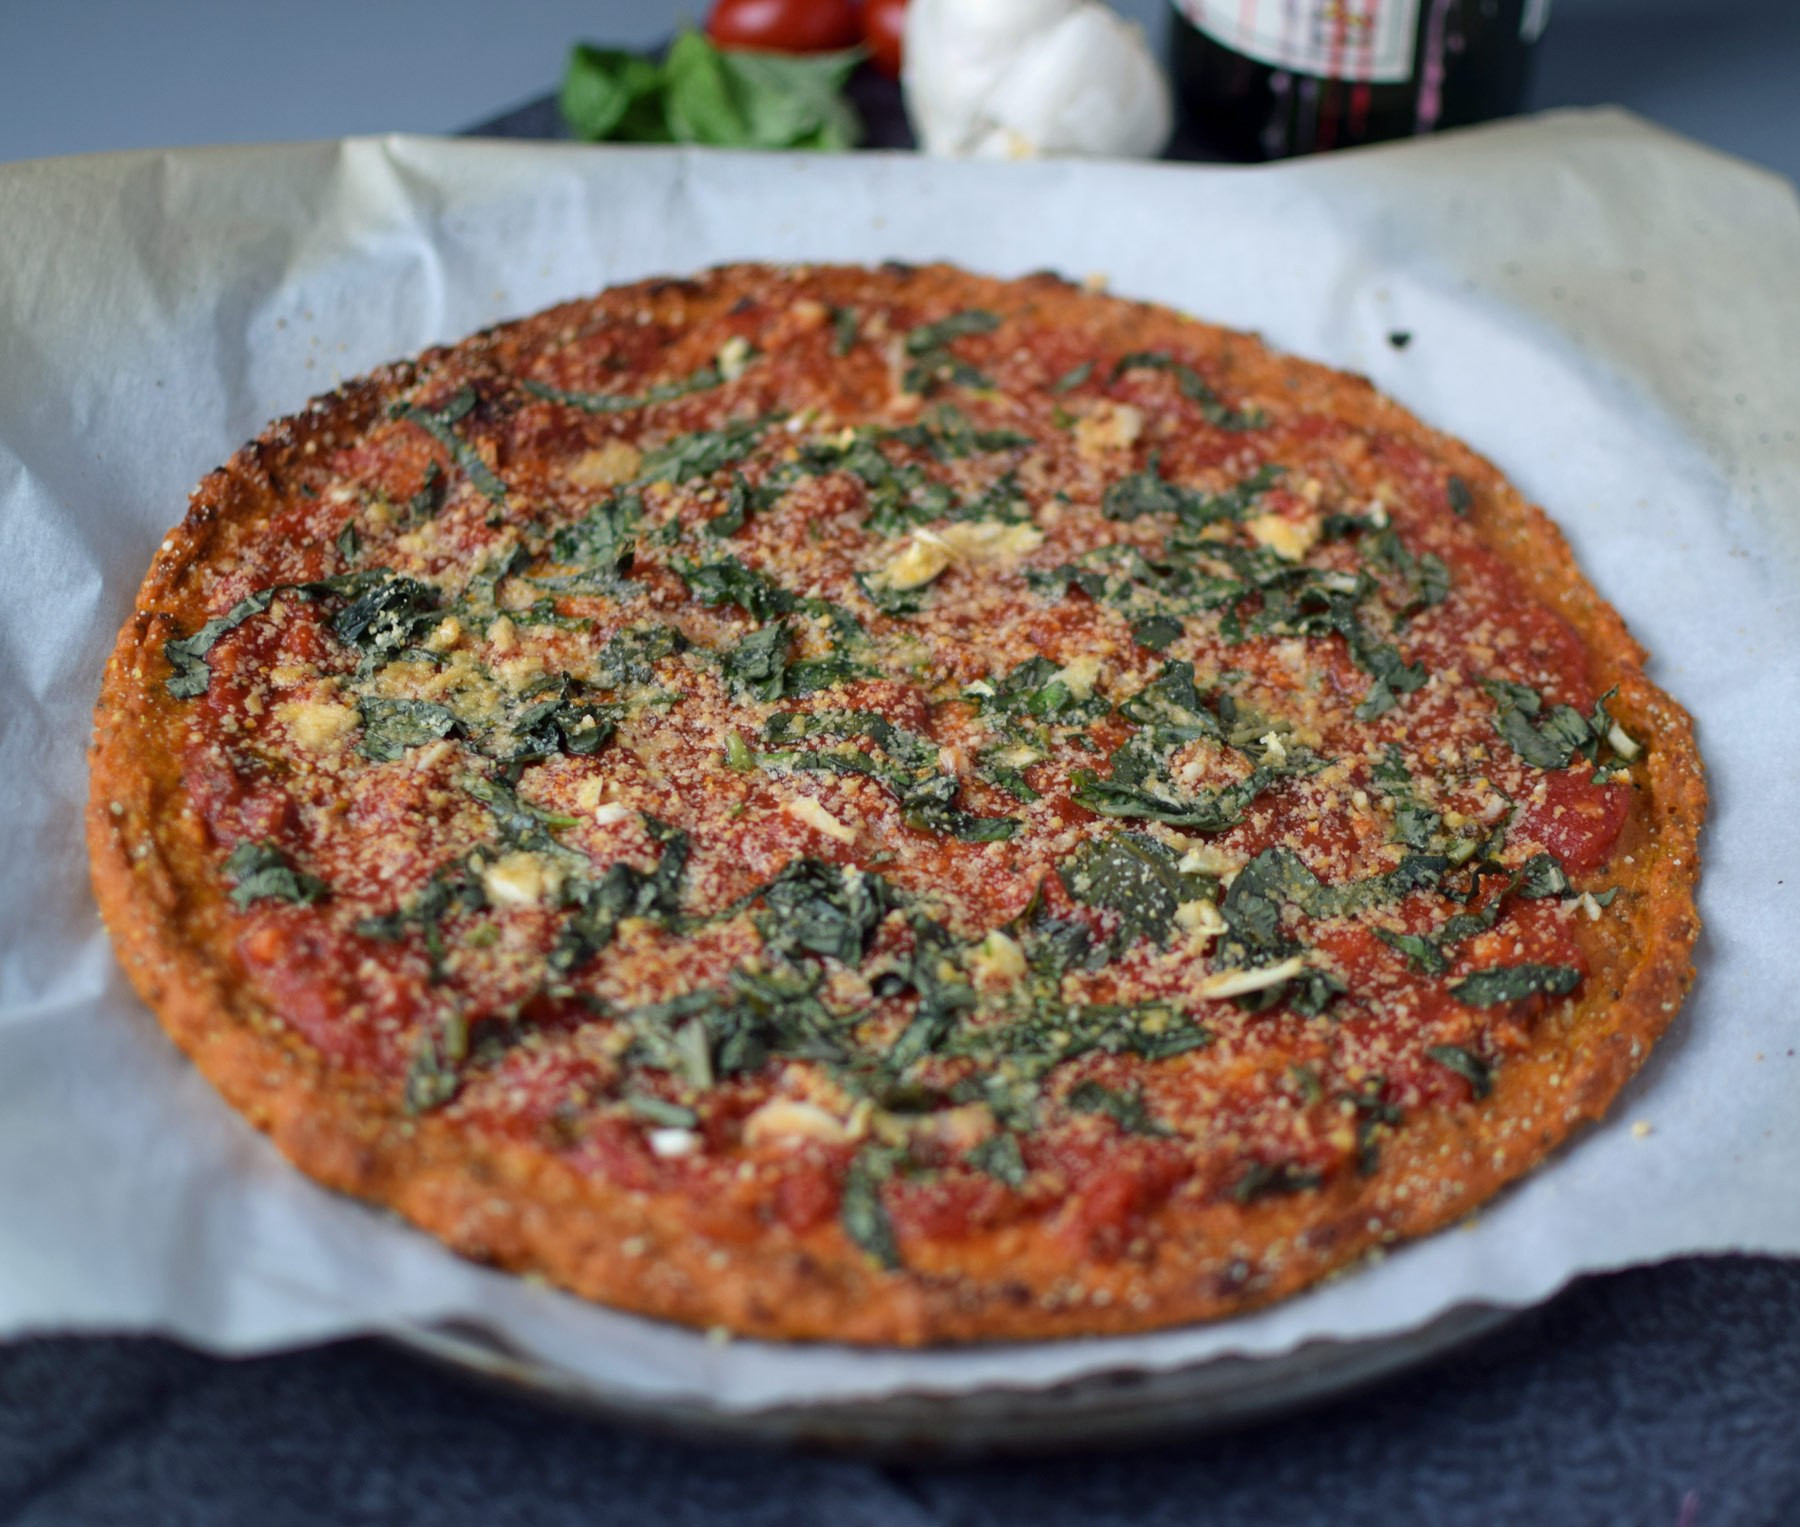 Sweet Potato Pizza  Roasted Garlic Sweet Potato Pizza Crust Vegan & Gluten Free